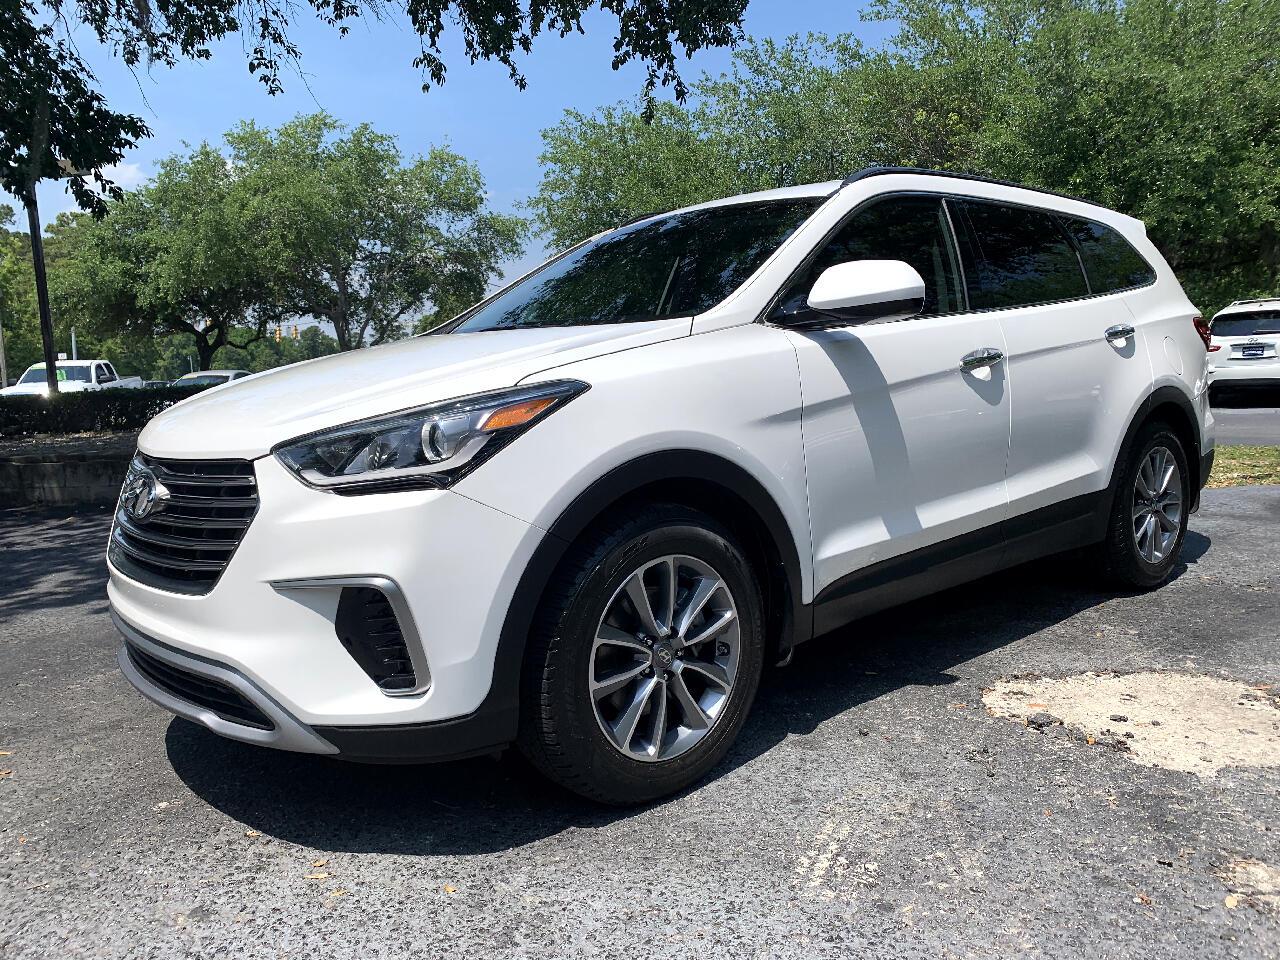 2018 Hyundai Santa Fe SE 3.3L Auto With 3rd Row Seat